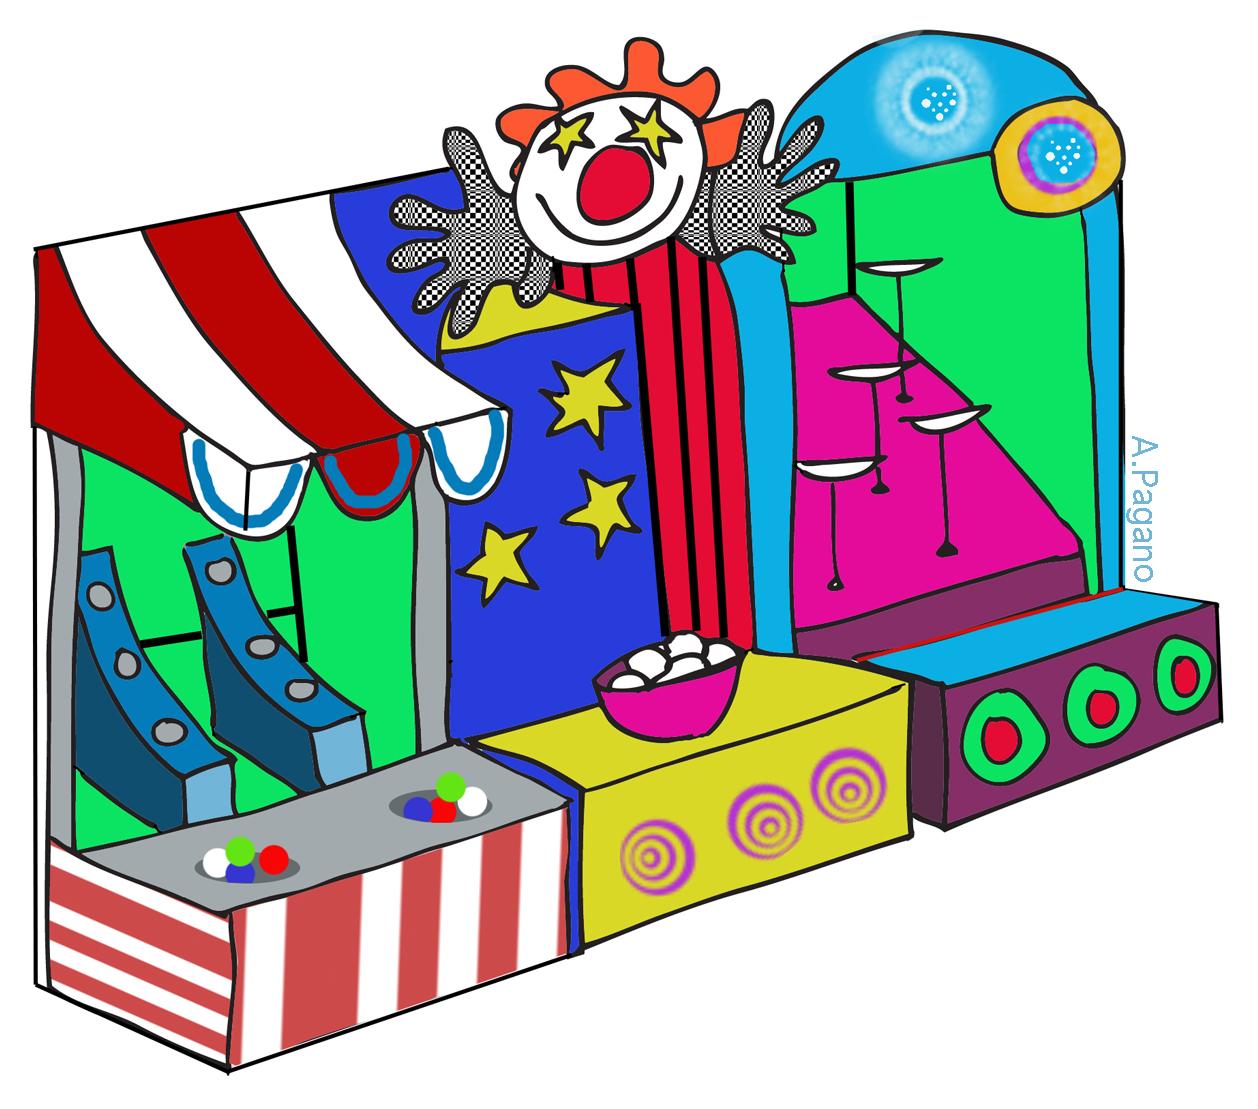 Carnival clipart carnival games. Clip art library